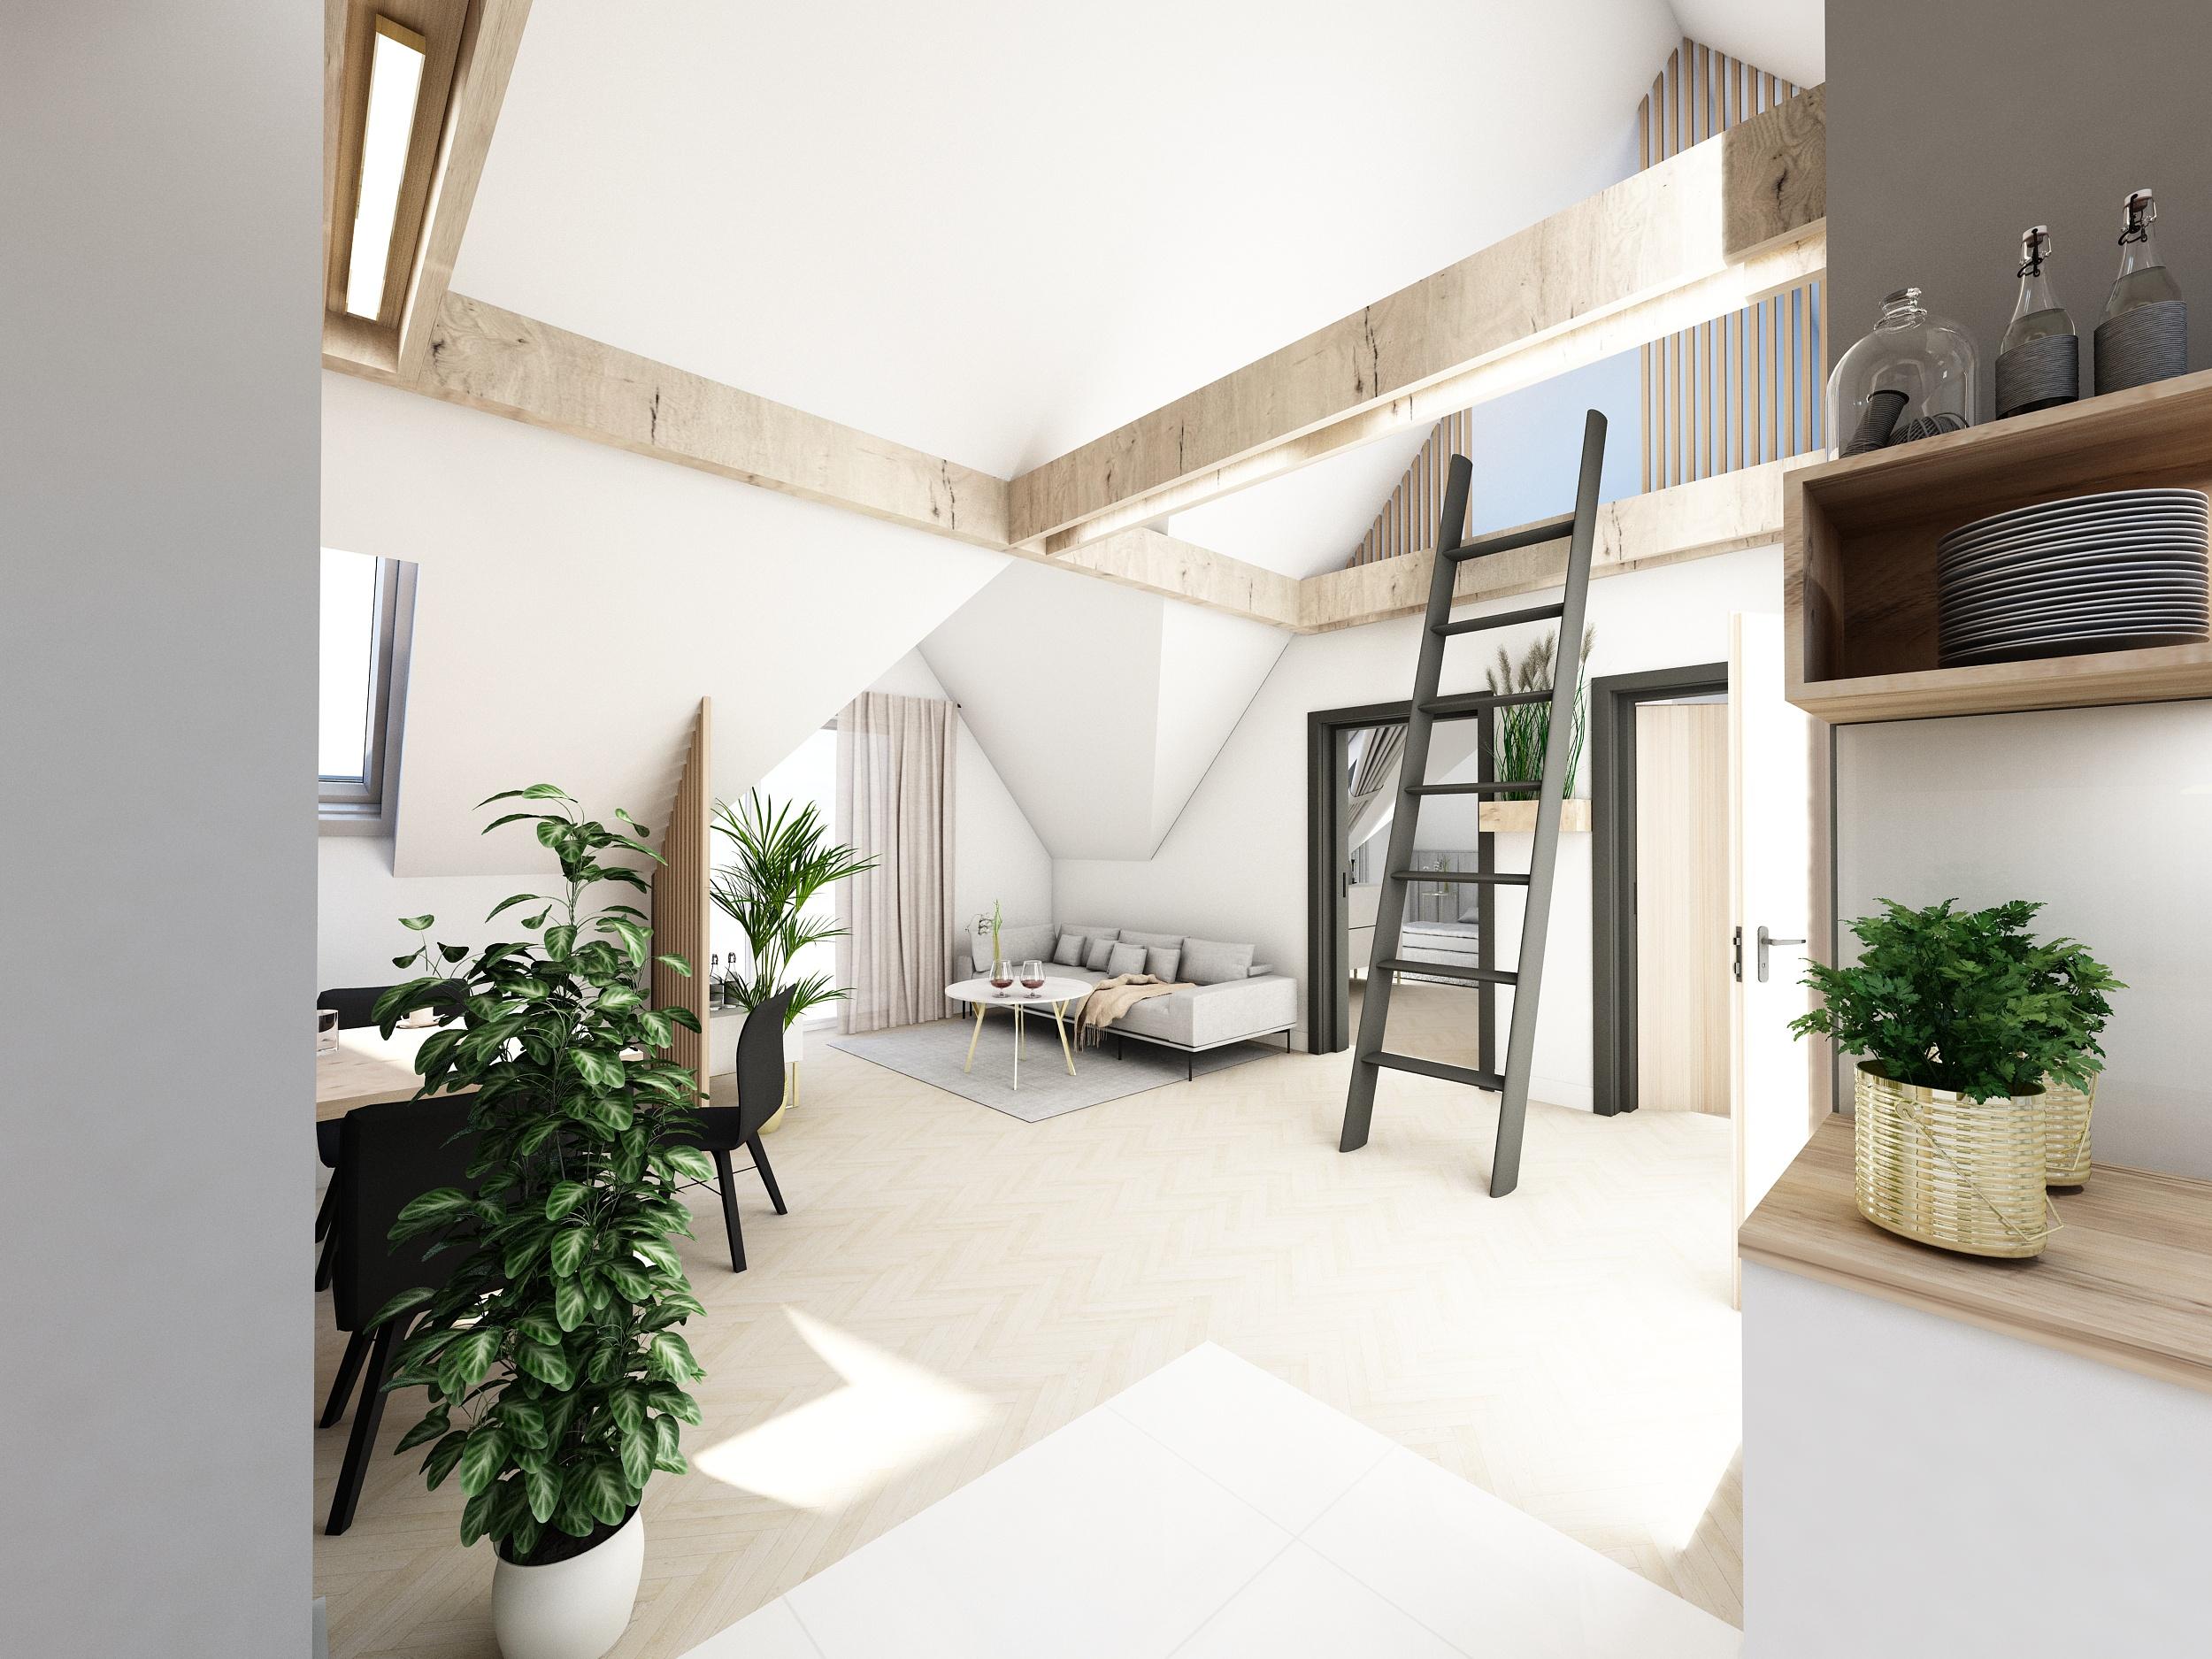 apartament zloty 2